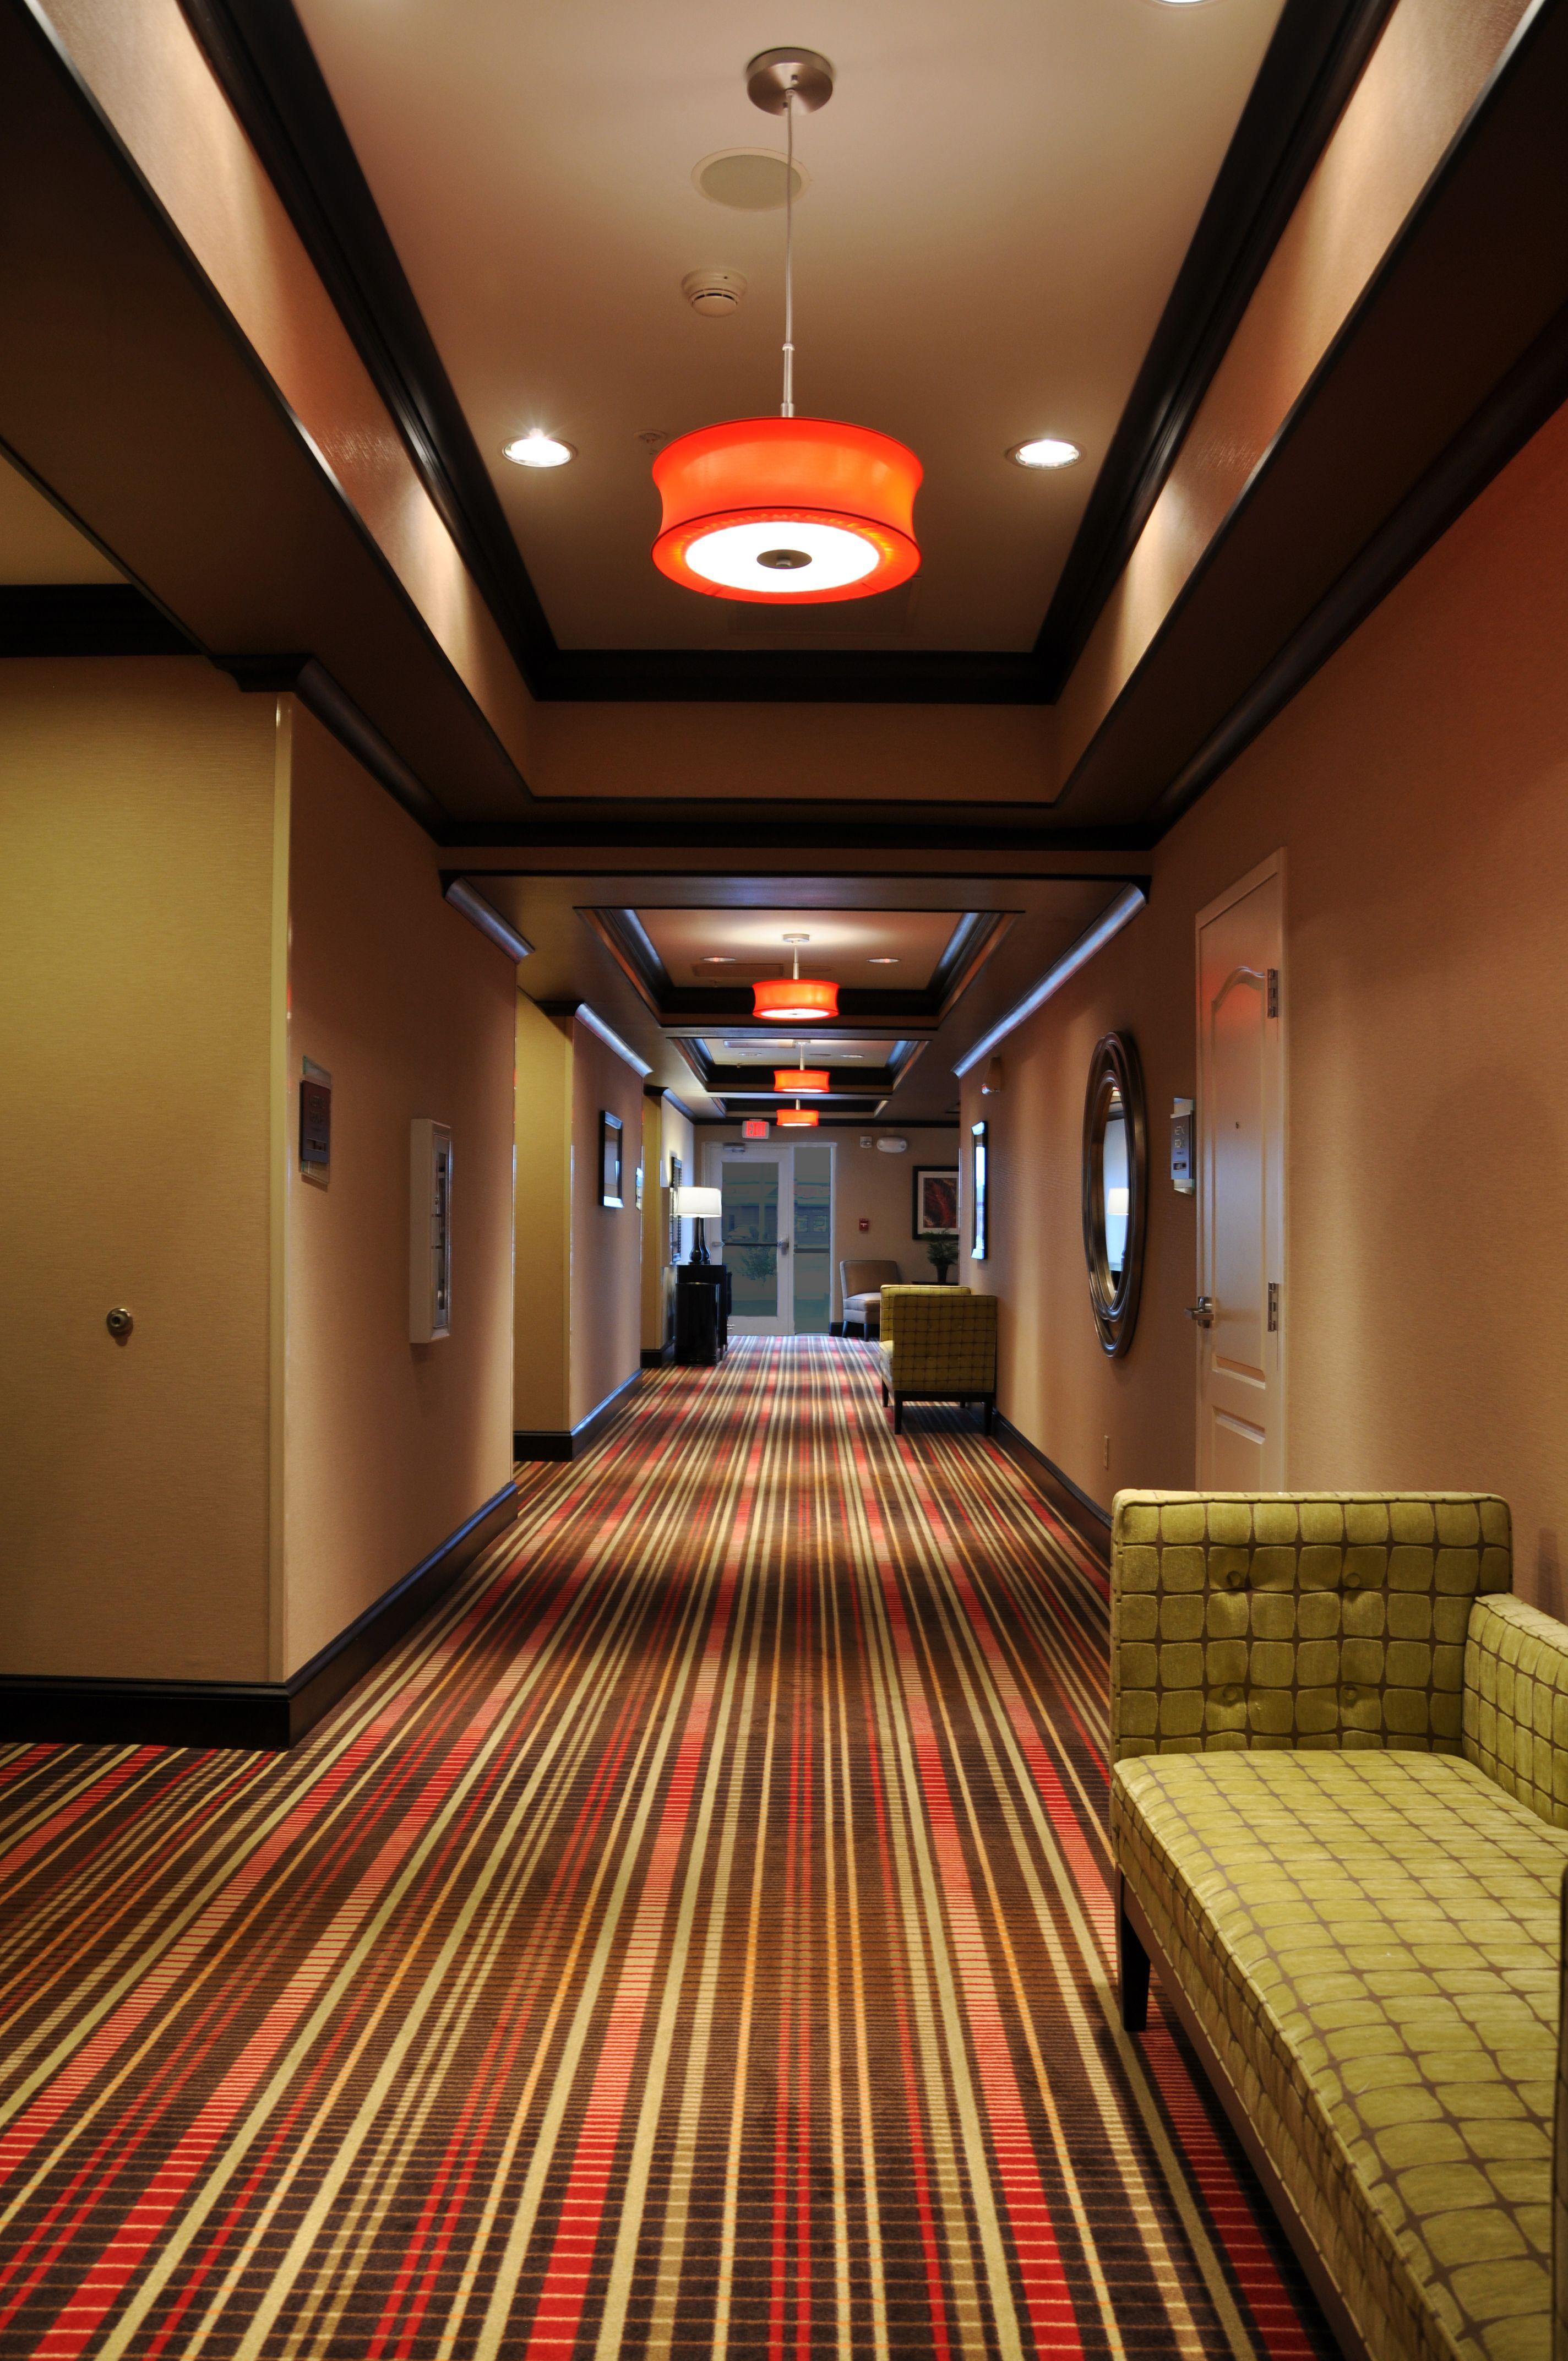 Hilton Garden Inn - Anniston, AL | becky keiser interiors ...